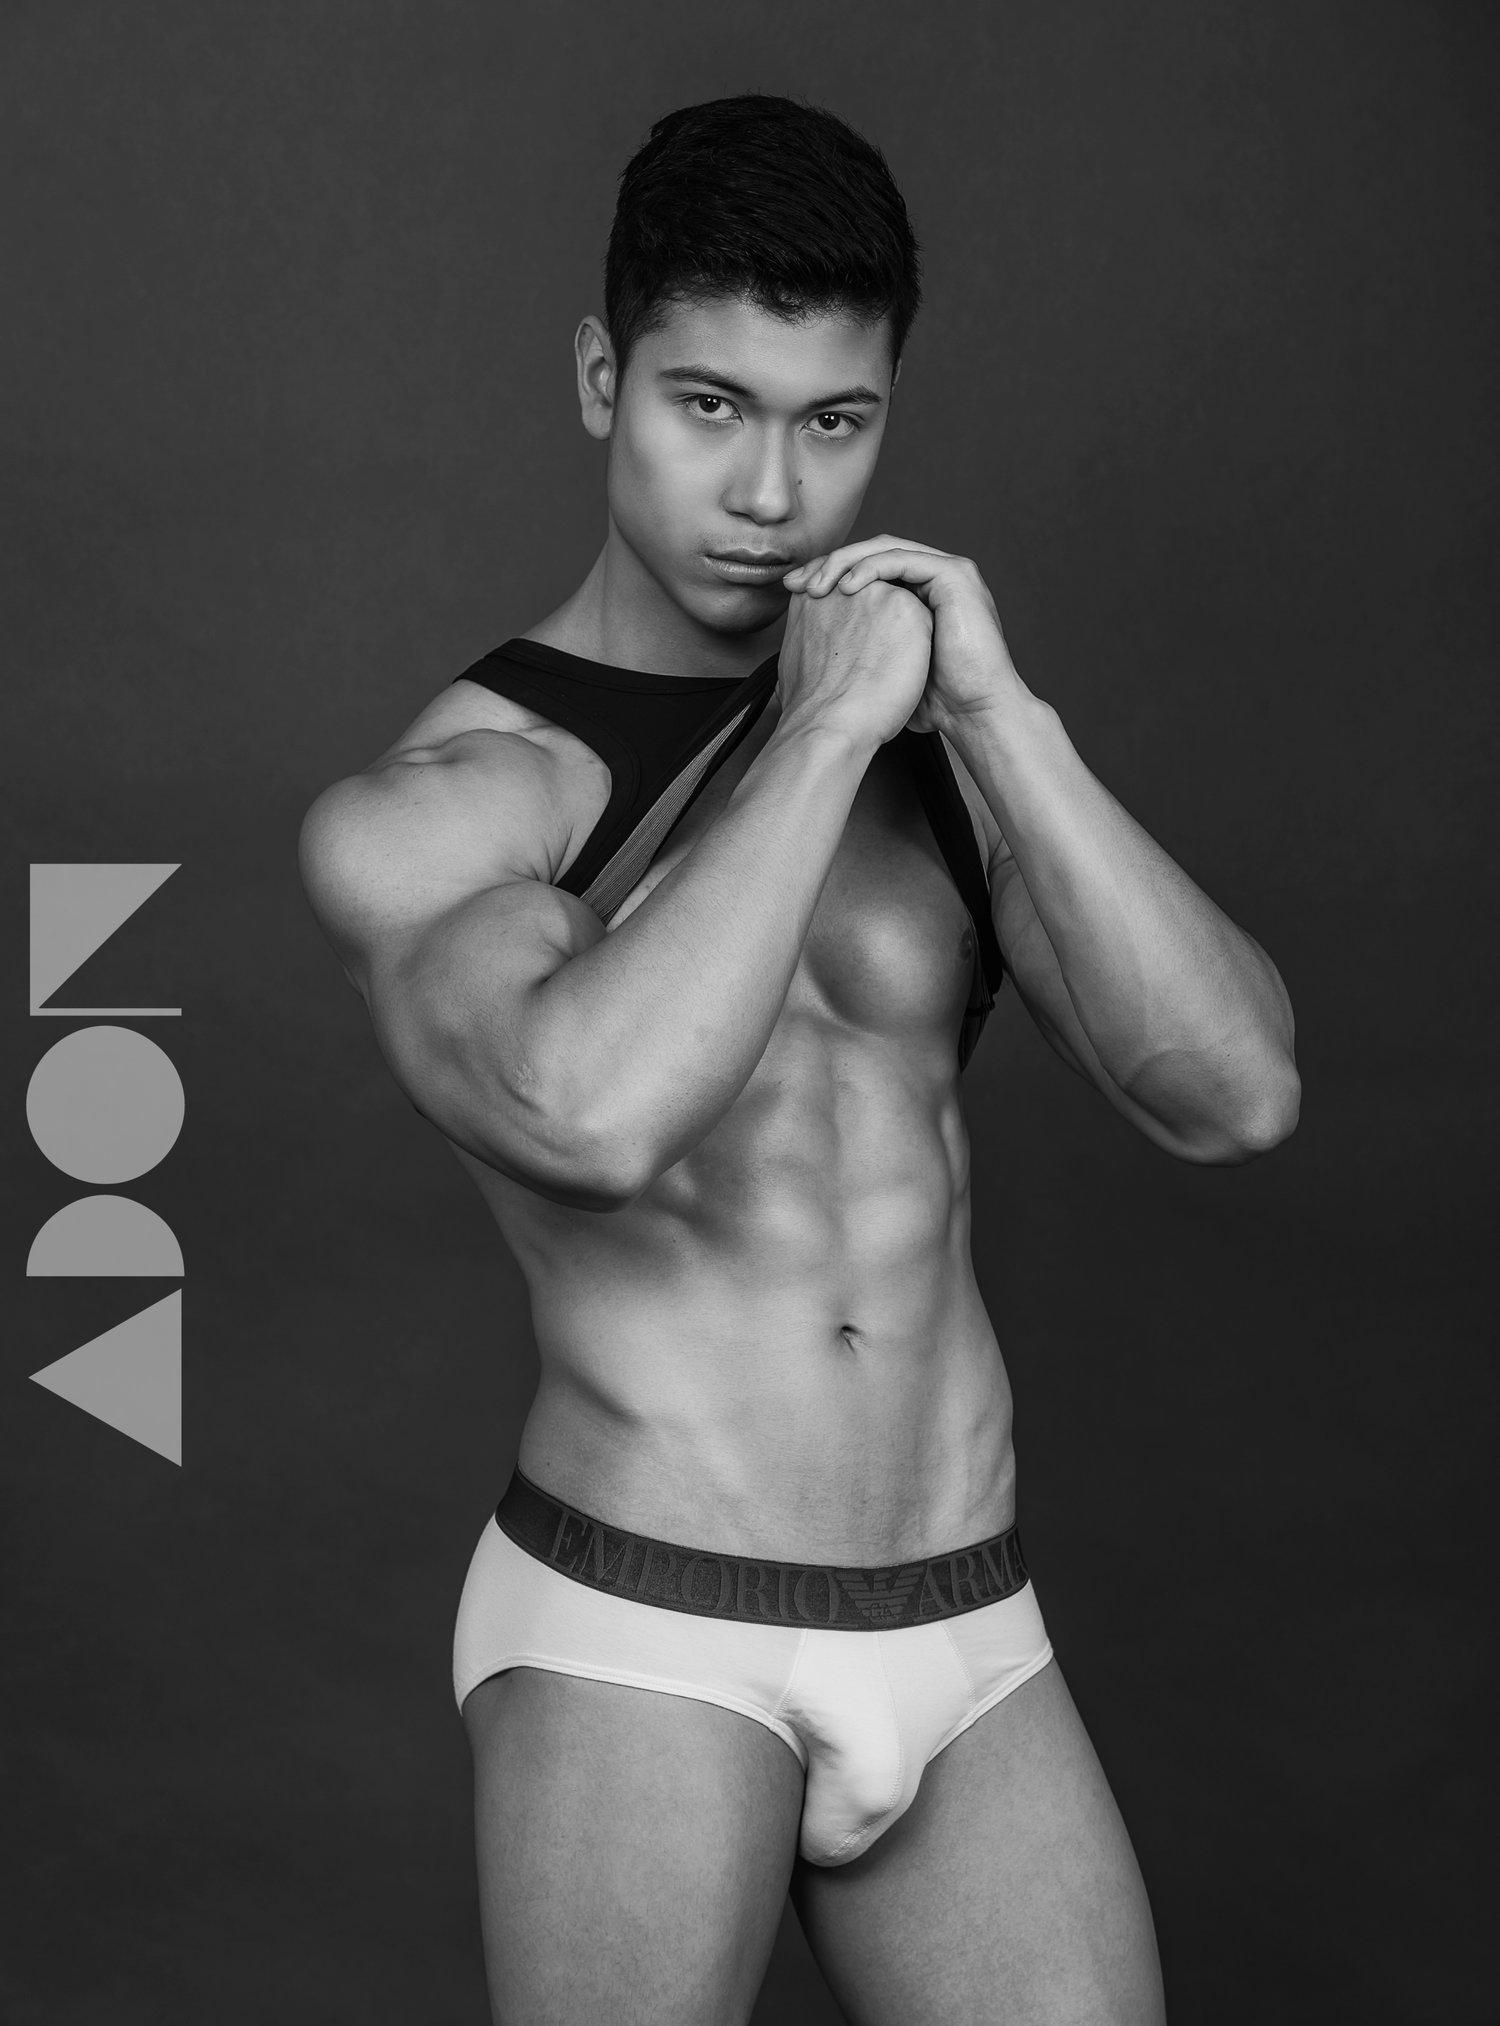 Adon Exclusive: Model Alejandro Legaria By Jason Oung